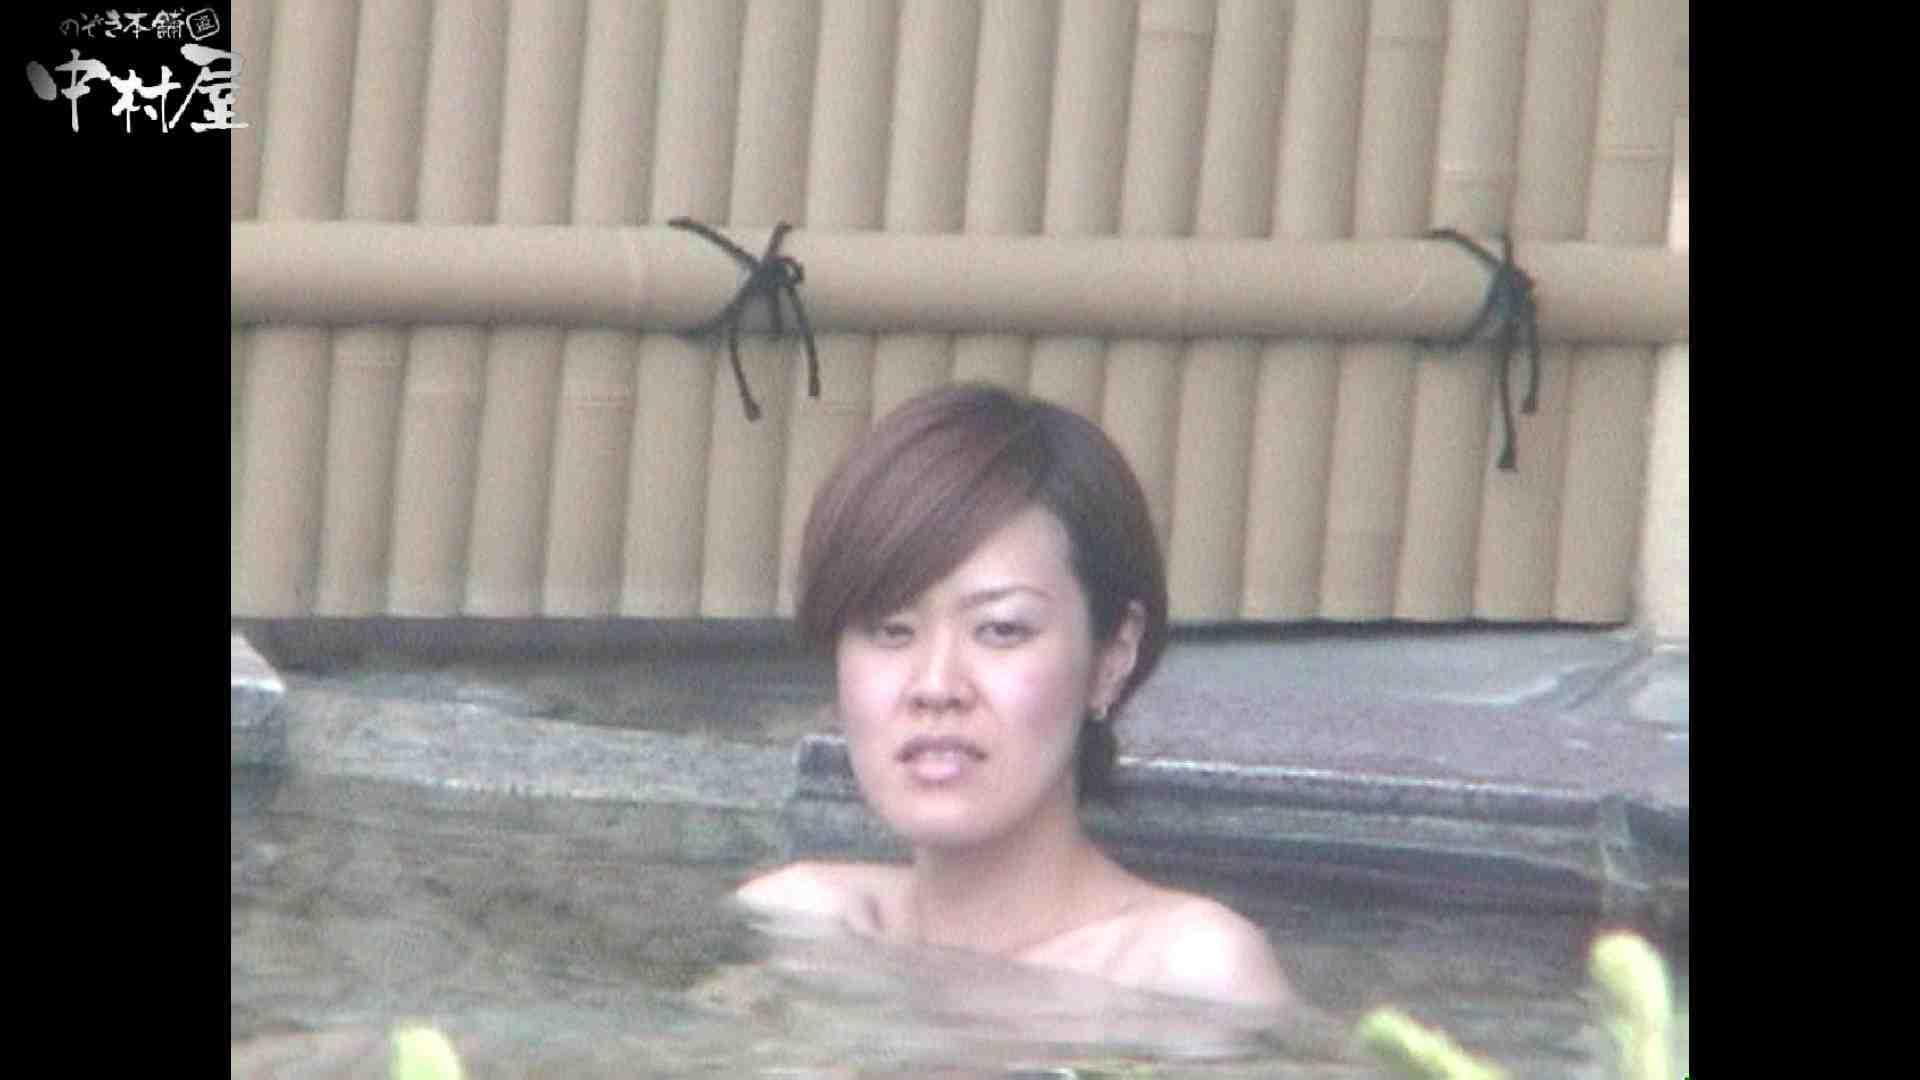 Aquaな露天風呂Vol.961 OL女体  65連発 45